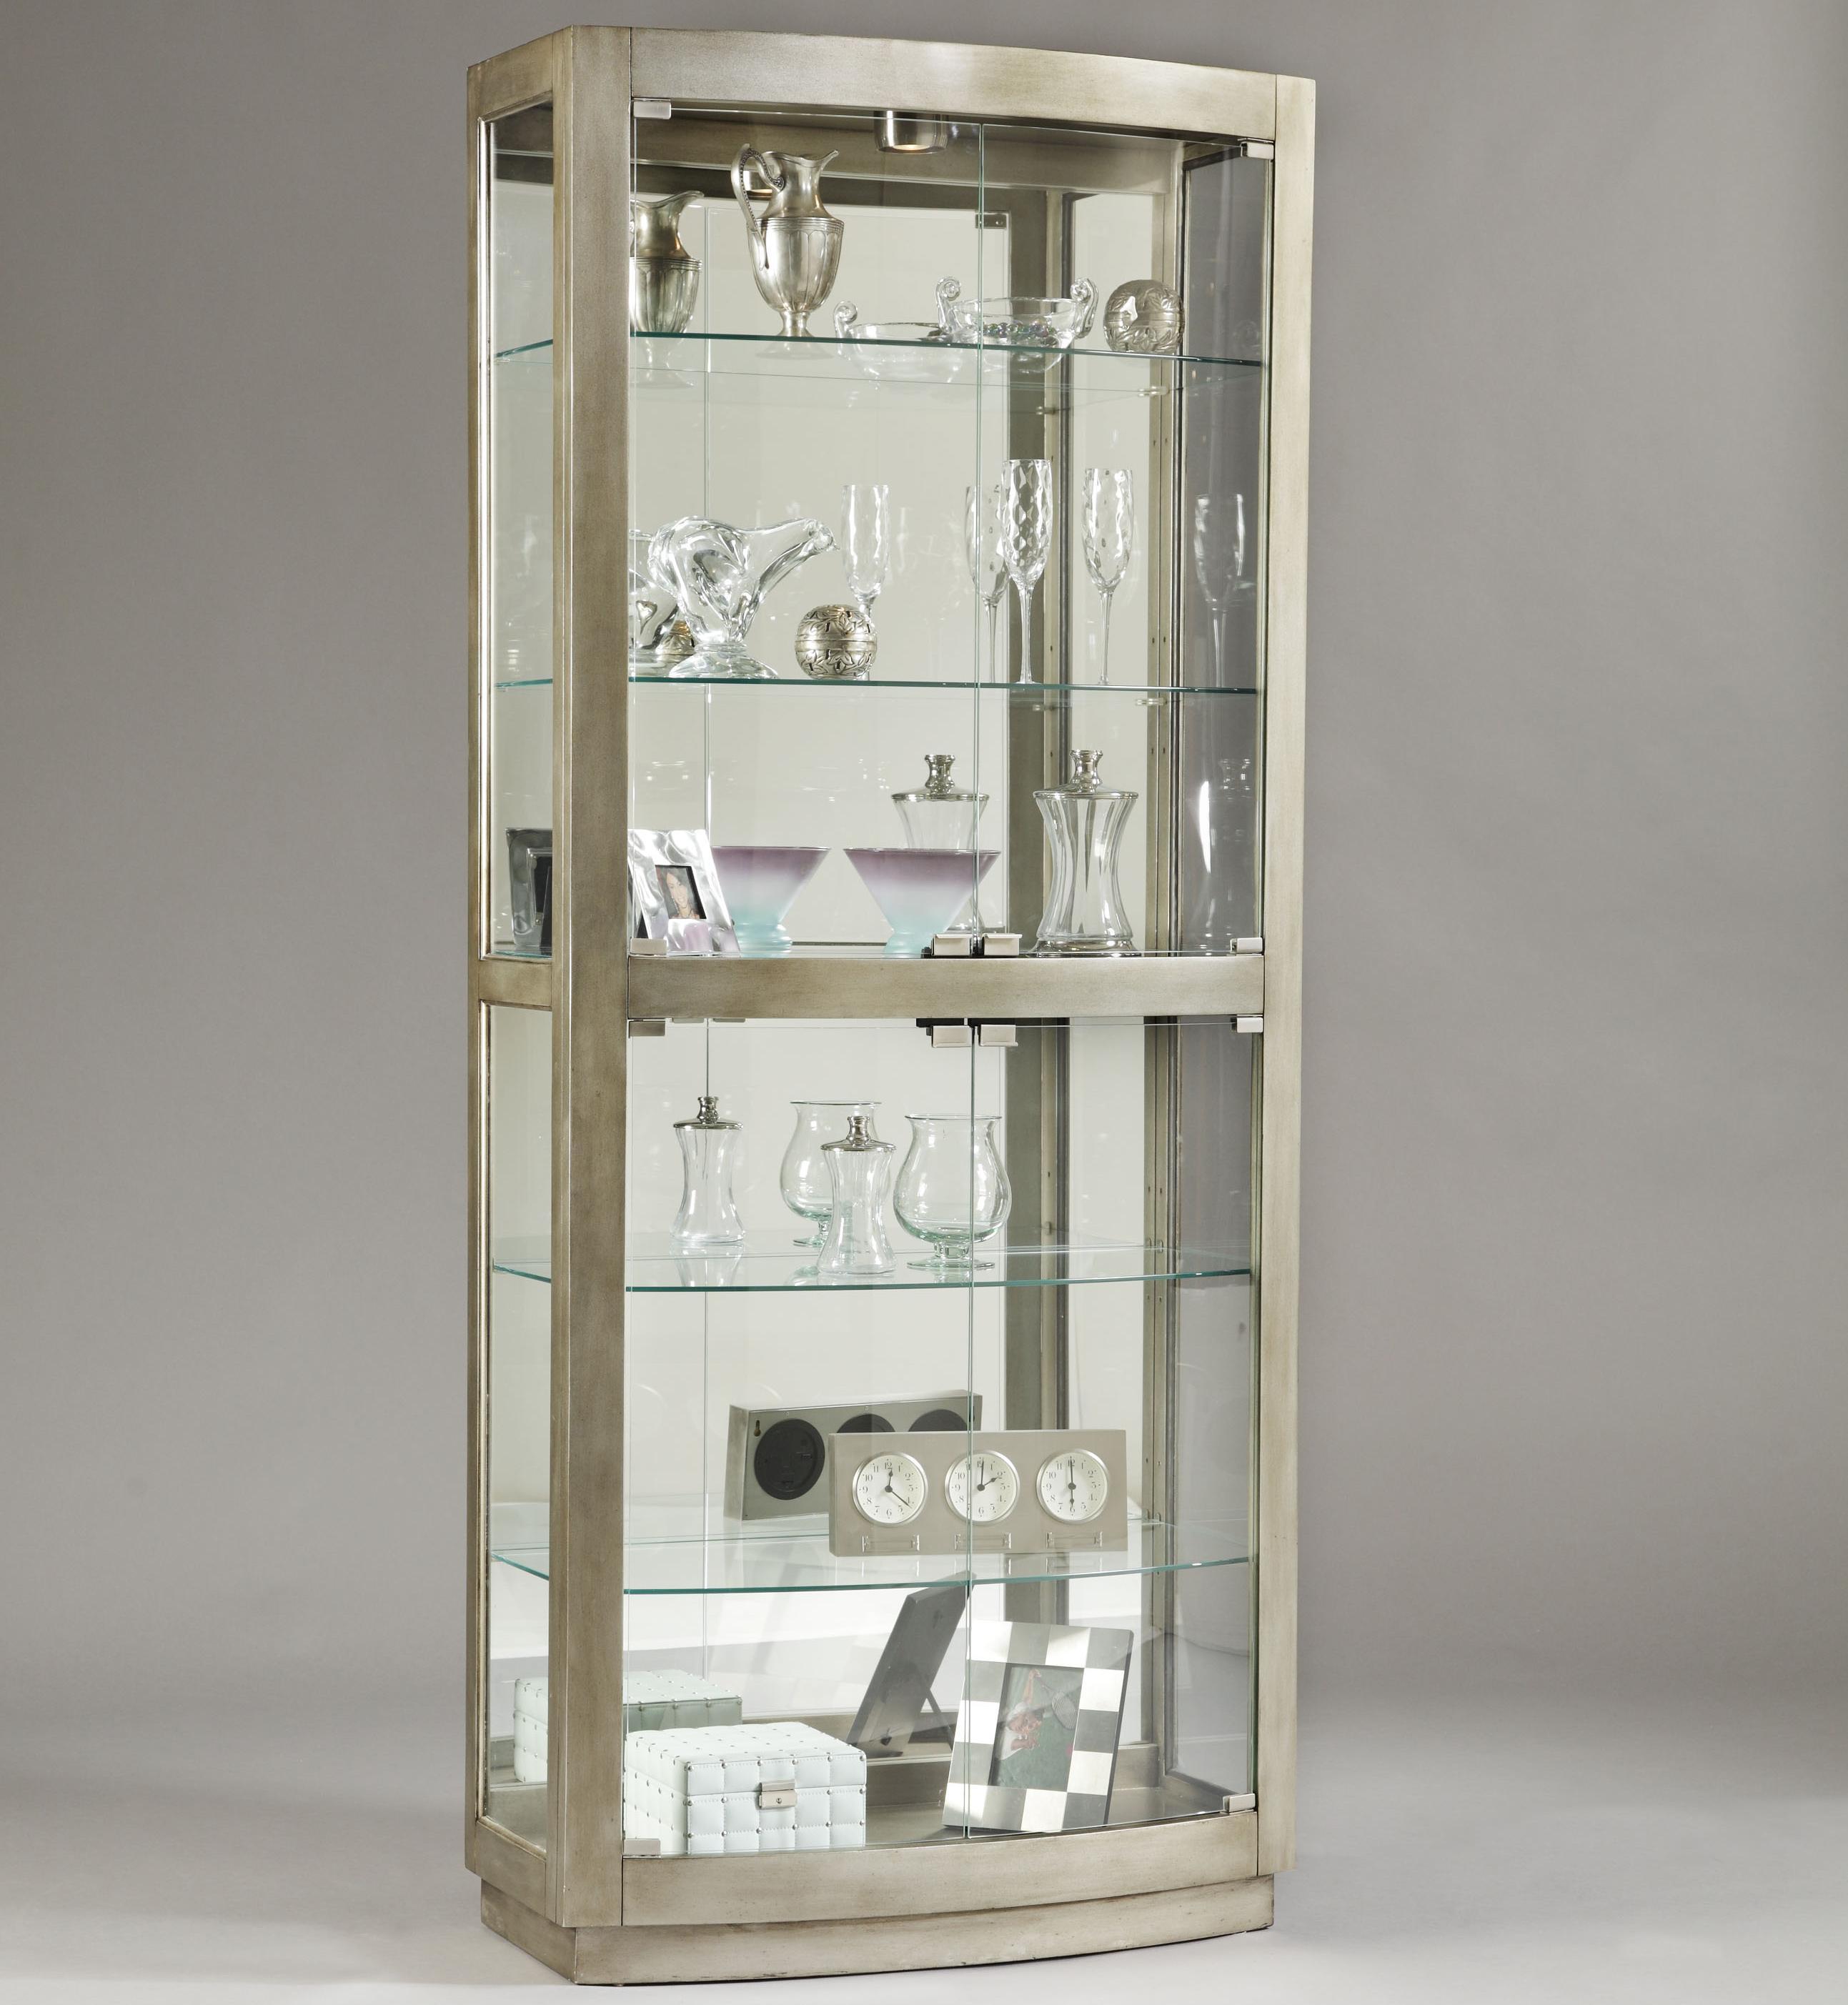 Pulaski furniture curios platinum curio cabinet for Cheap kitchen cabinets wilmington nc